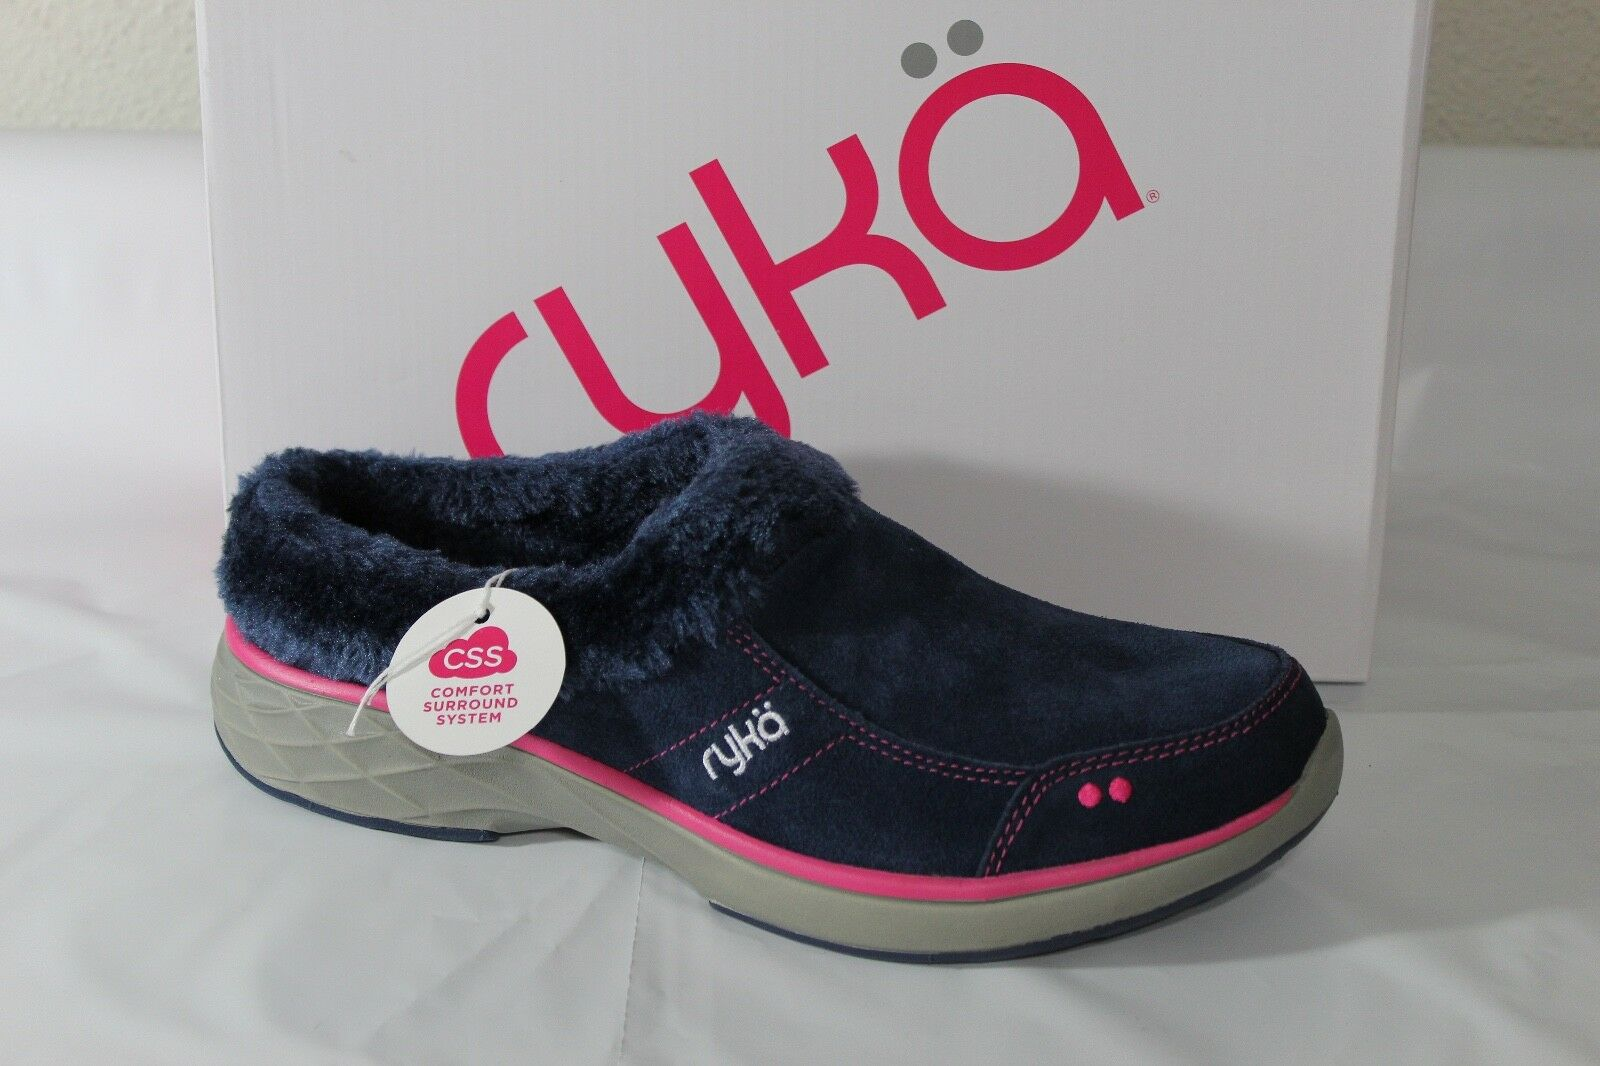 RYKA LUXURY SUEDE  FAUX FUR SLIP-ON Donna CLOGS/SLIPPER, NAVY/PINK, F0347L1400